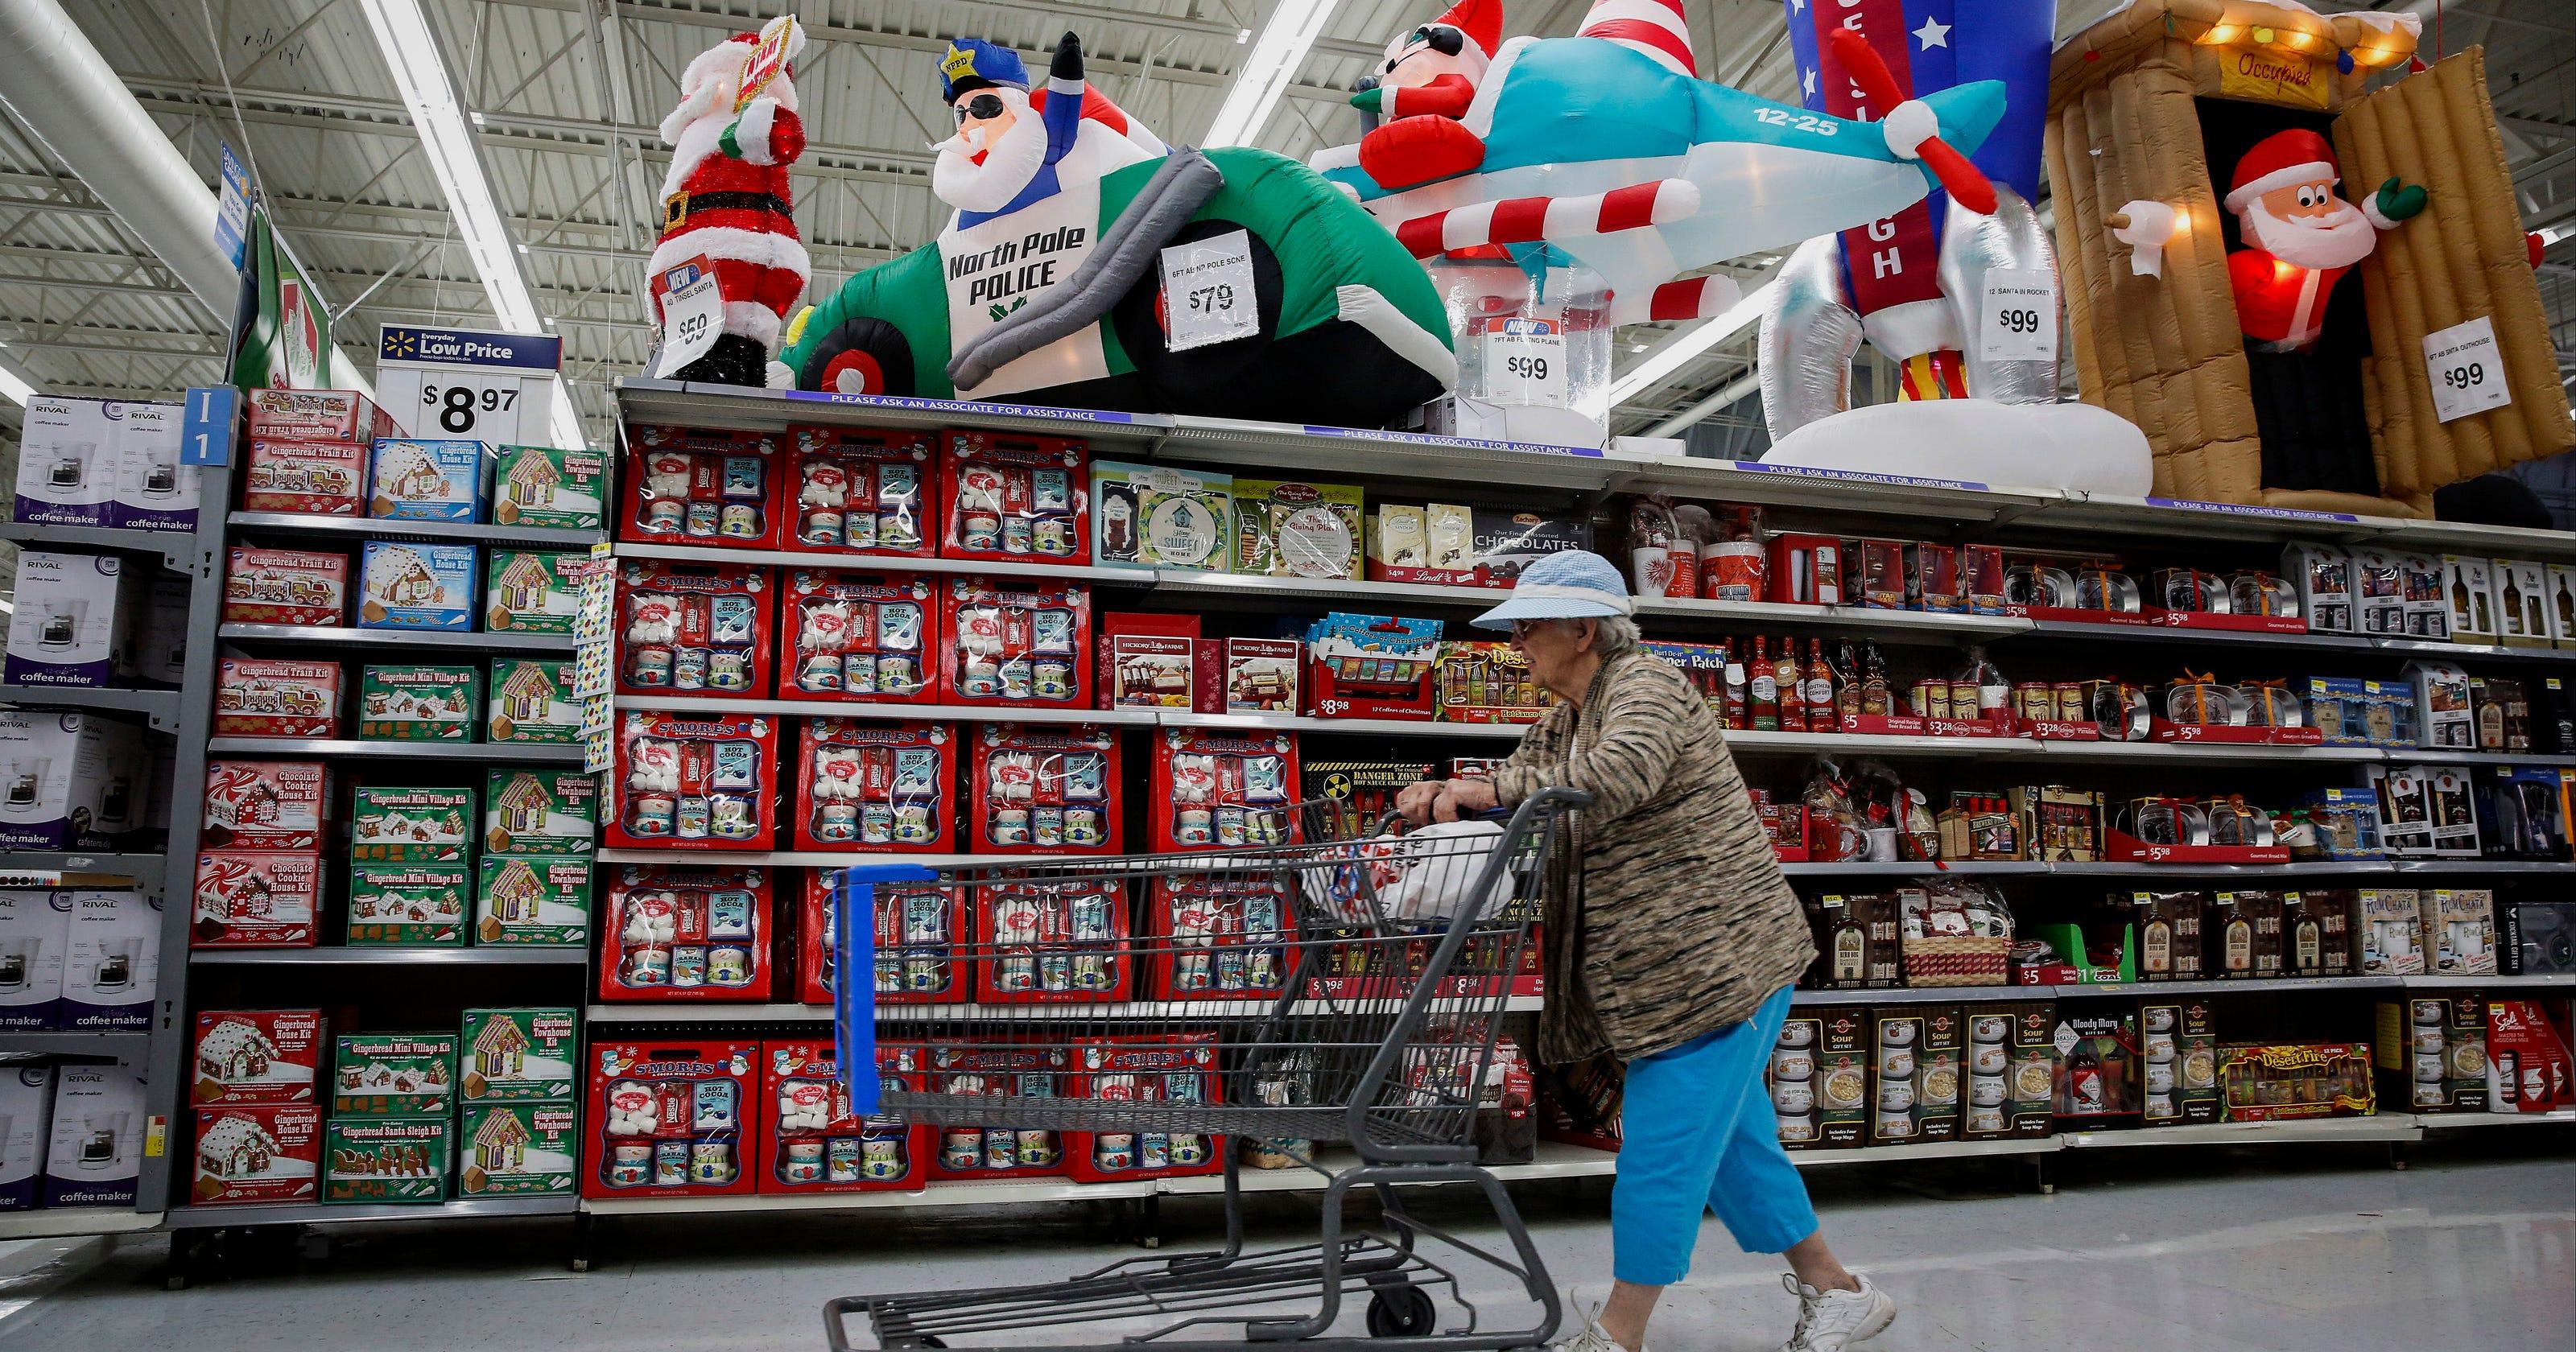 Walmart One-Hour guarantee has a 'catch'